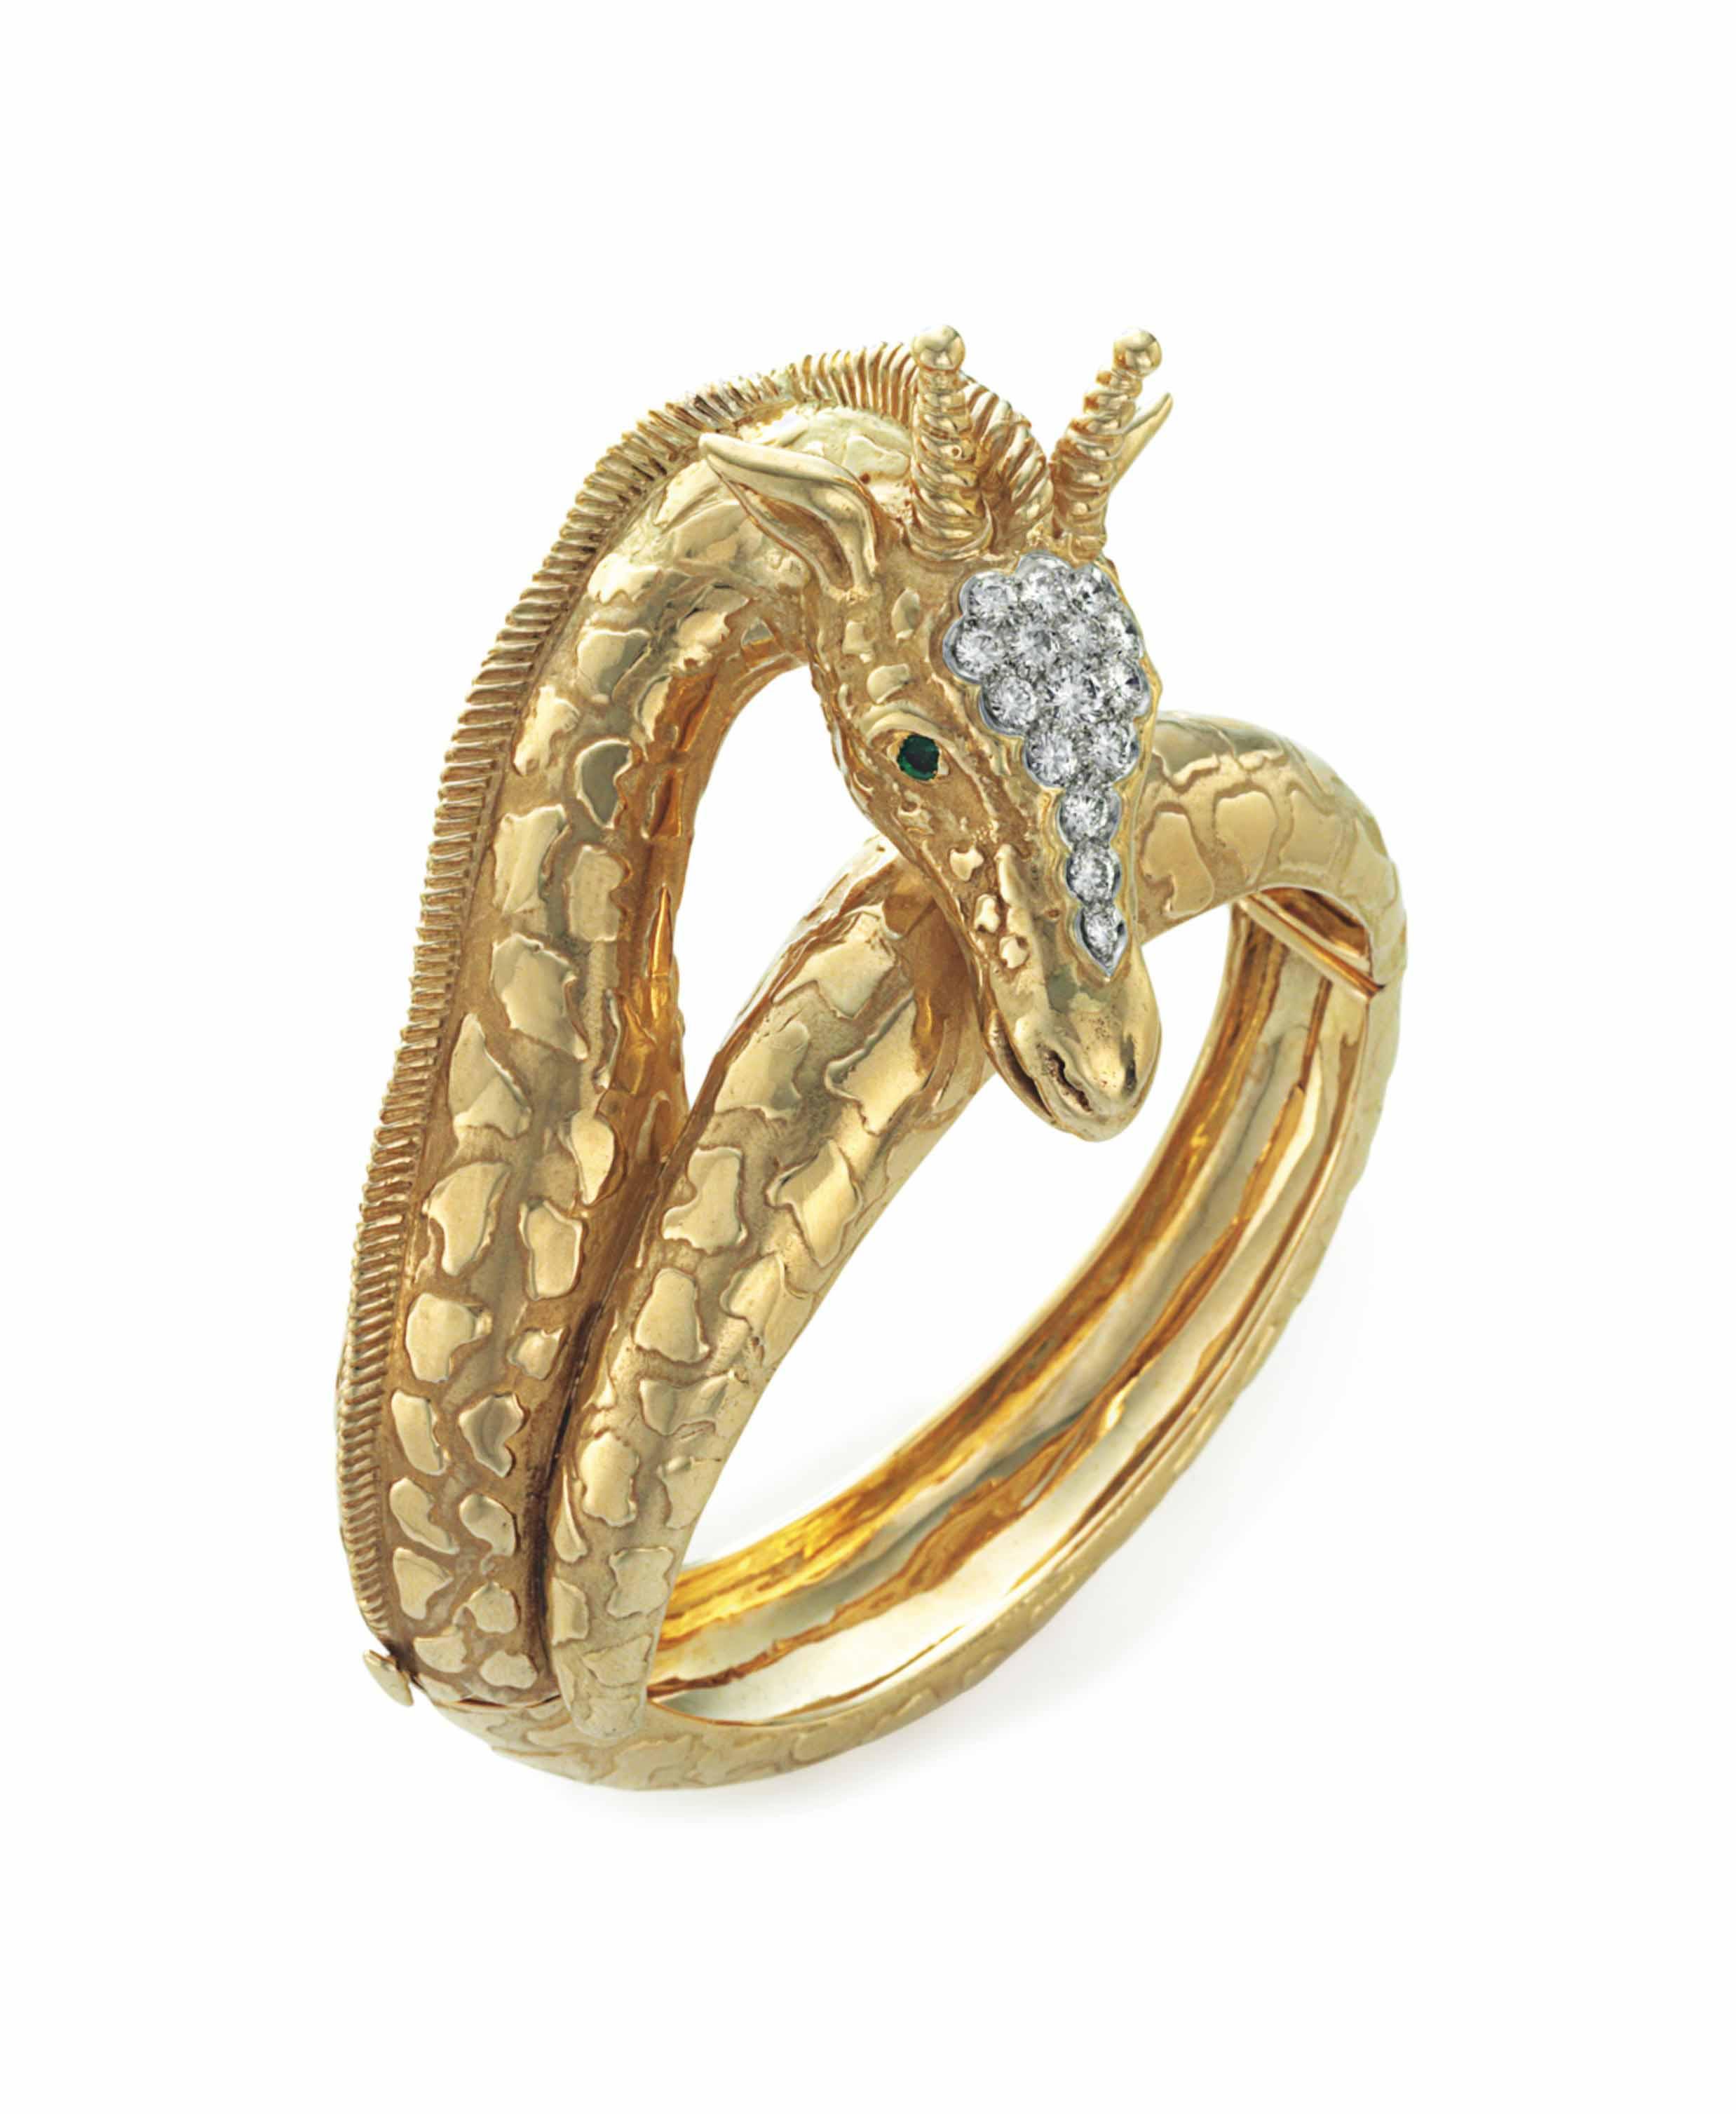 A DIAMOND, EMERALD AND GOLD GI